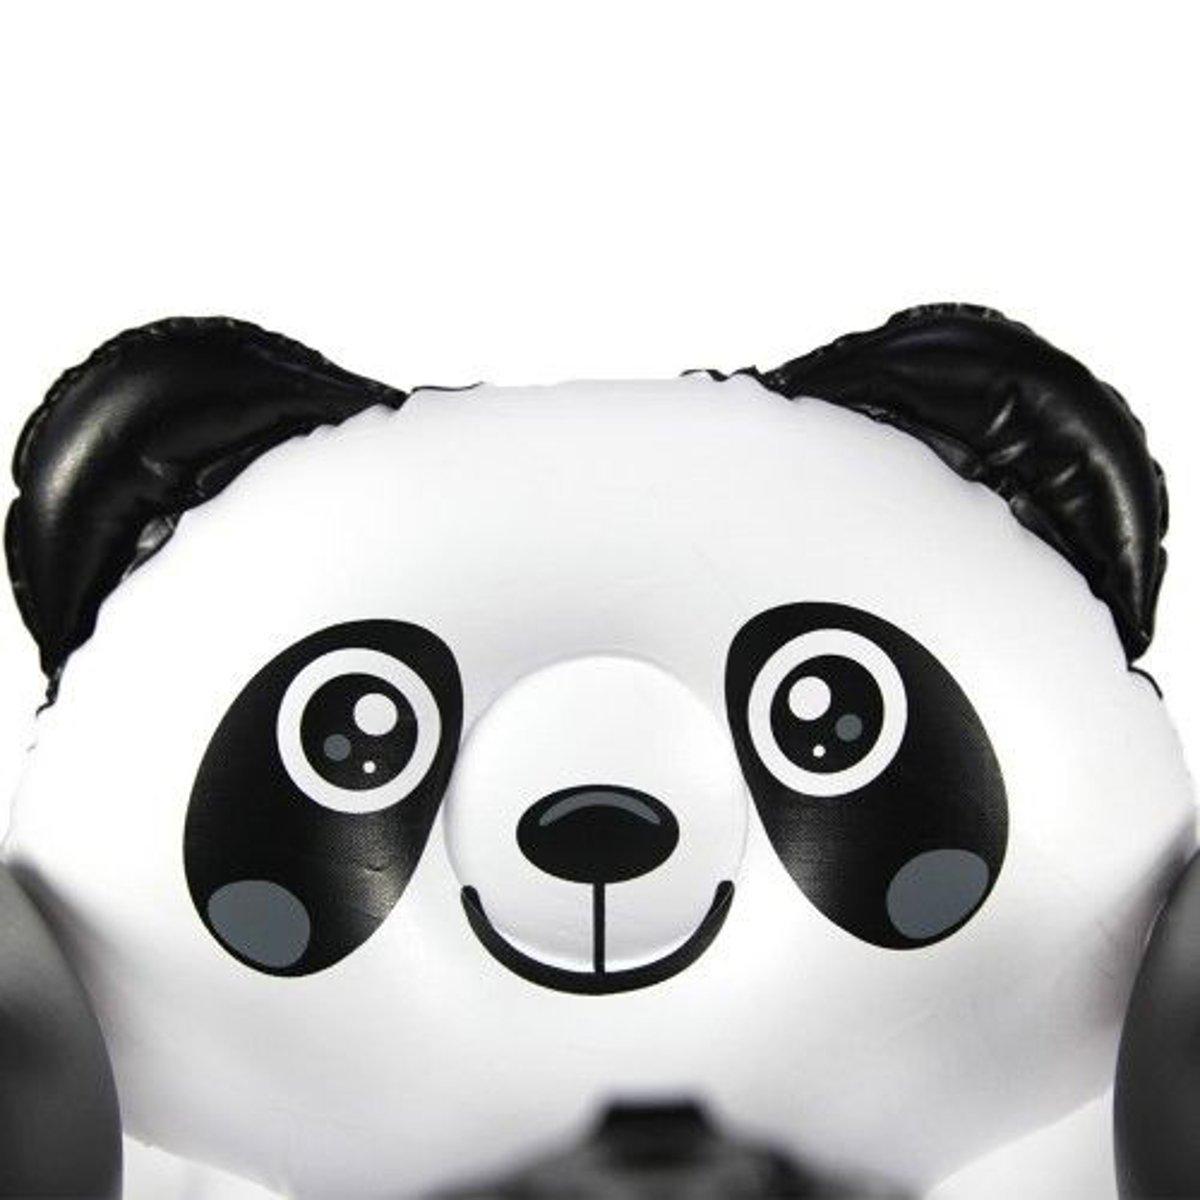 TENGGO Panda Inflable del Flotador Piscina Agua Balsa Asiento De Bebé Juguetes De Baño: Amazon.es: Hogar